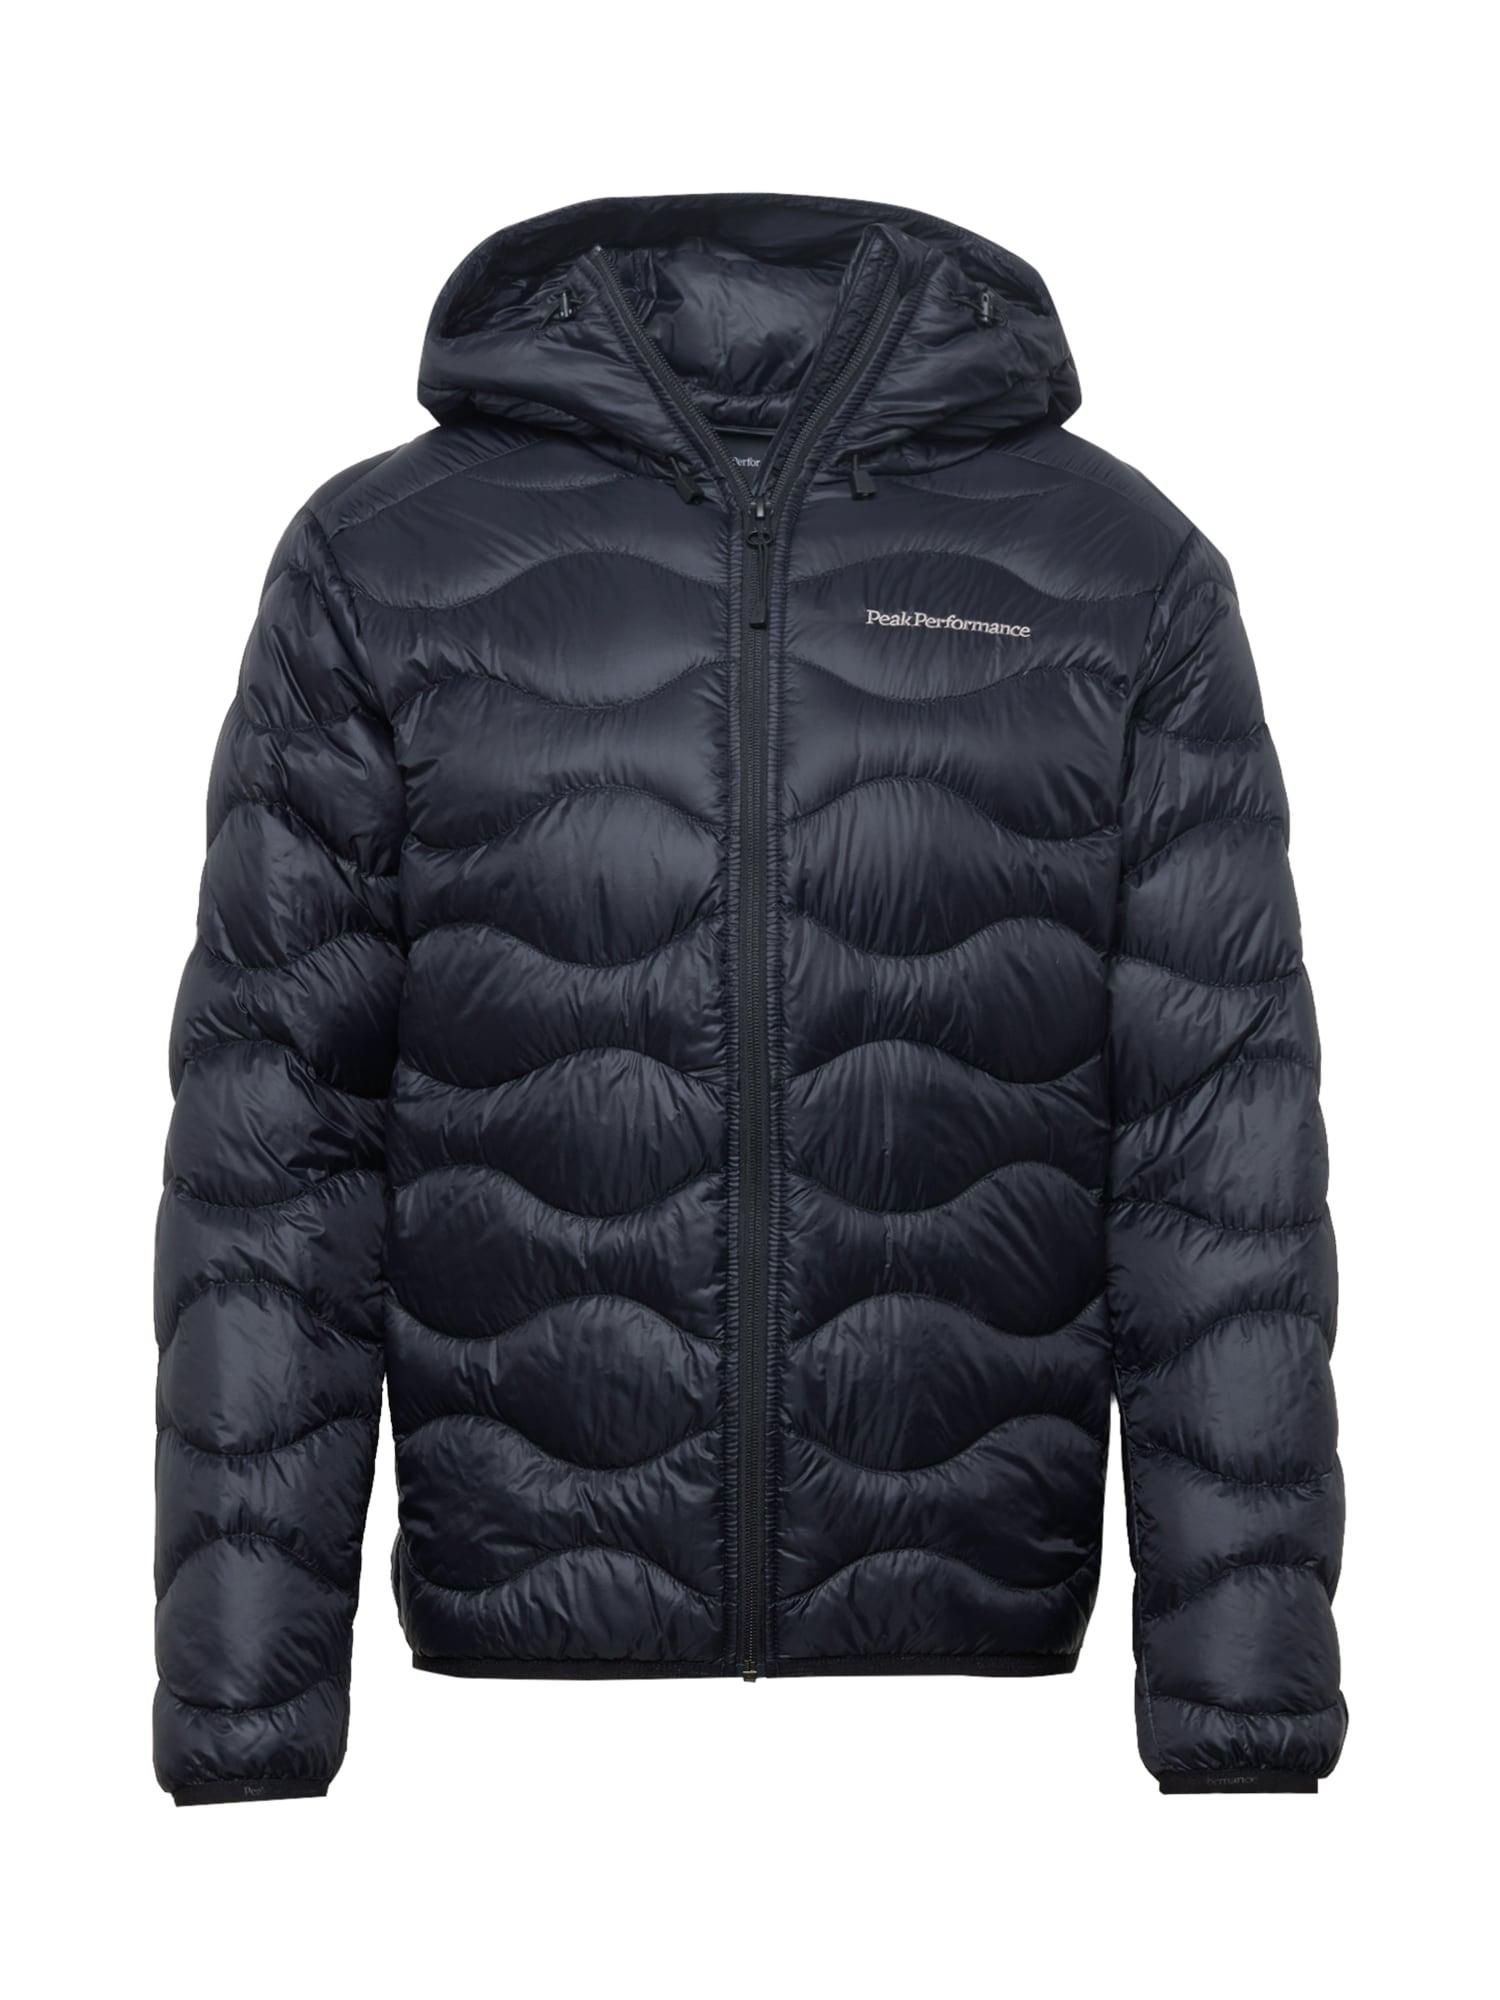 PEAK PERFORMANCE Outdoorová bunda  černá